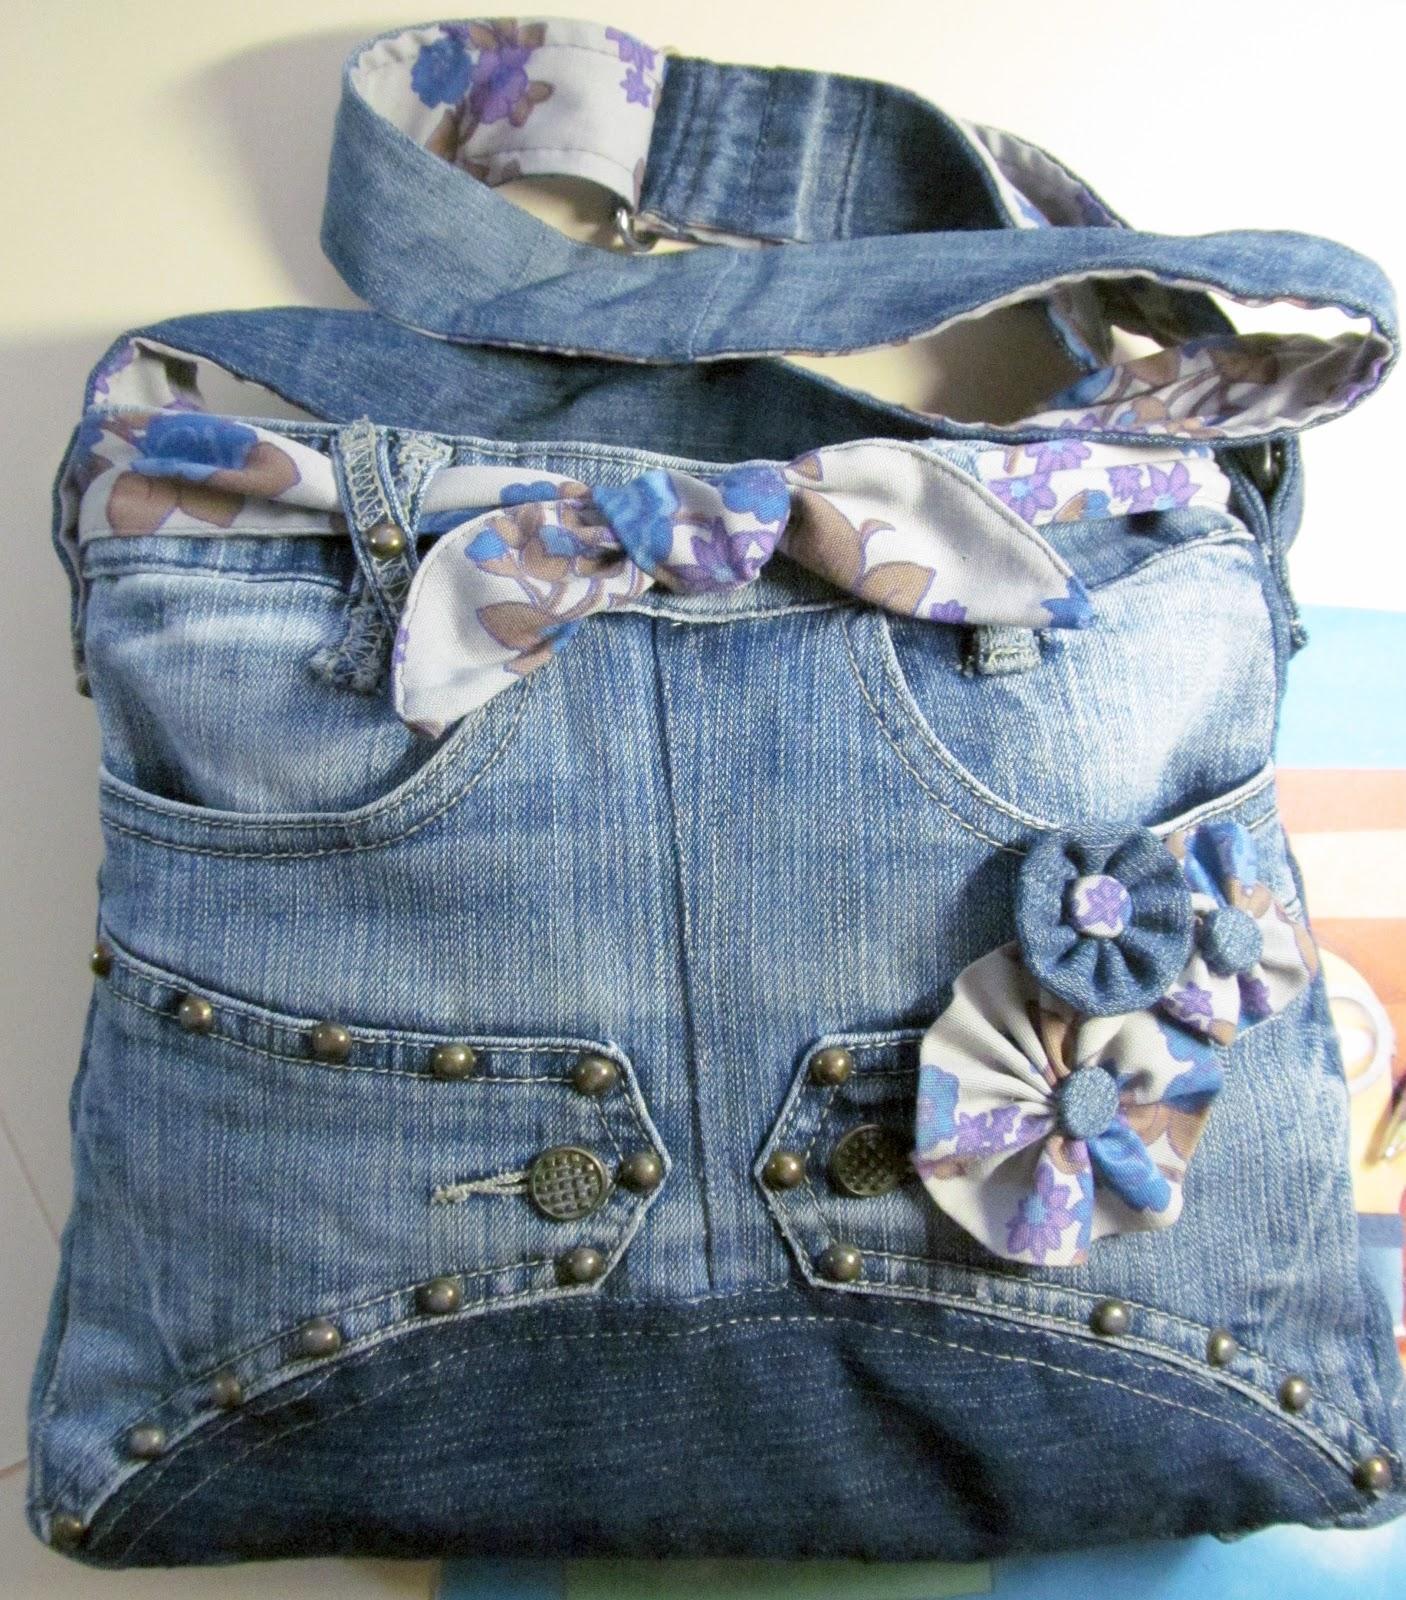 Переделка джинс своими руками фото